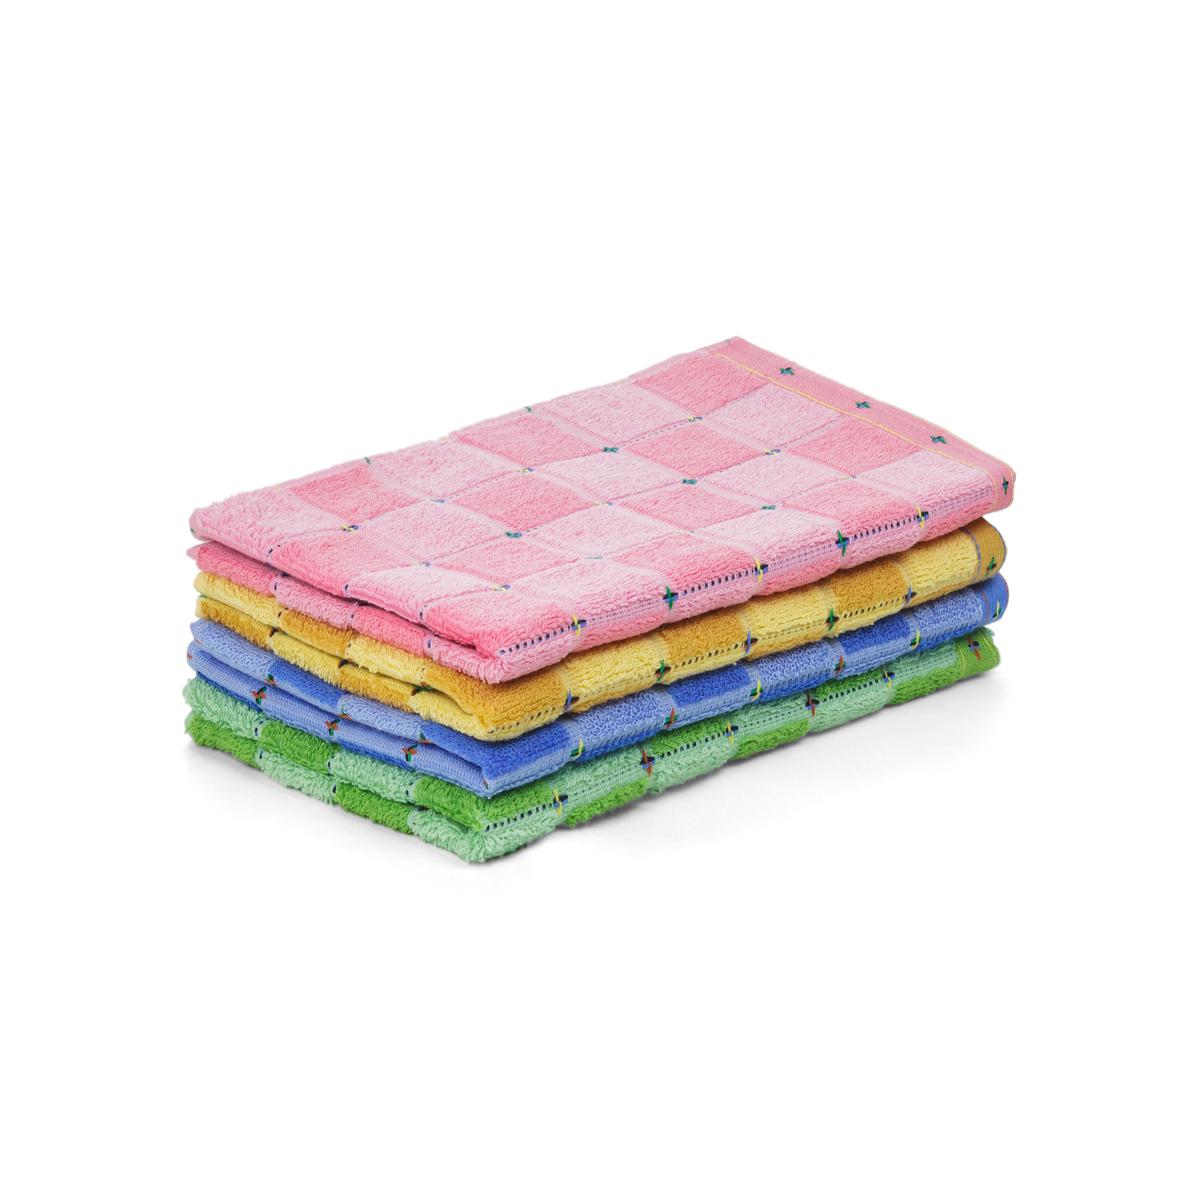 Полотенце Клетка Розовый р. 34х78Махровые полотенца<br><br><br>Тип: Полотенце<br>Размер: 34х78<br>Материал: Махра